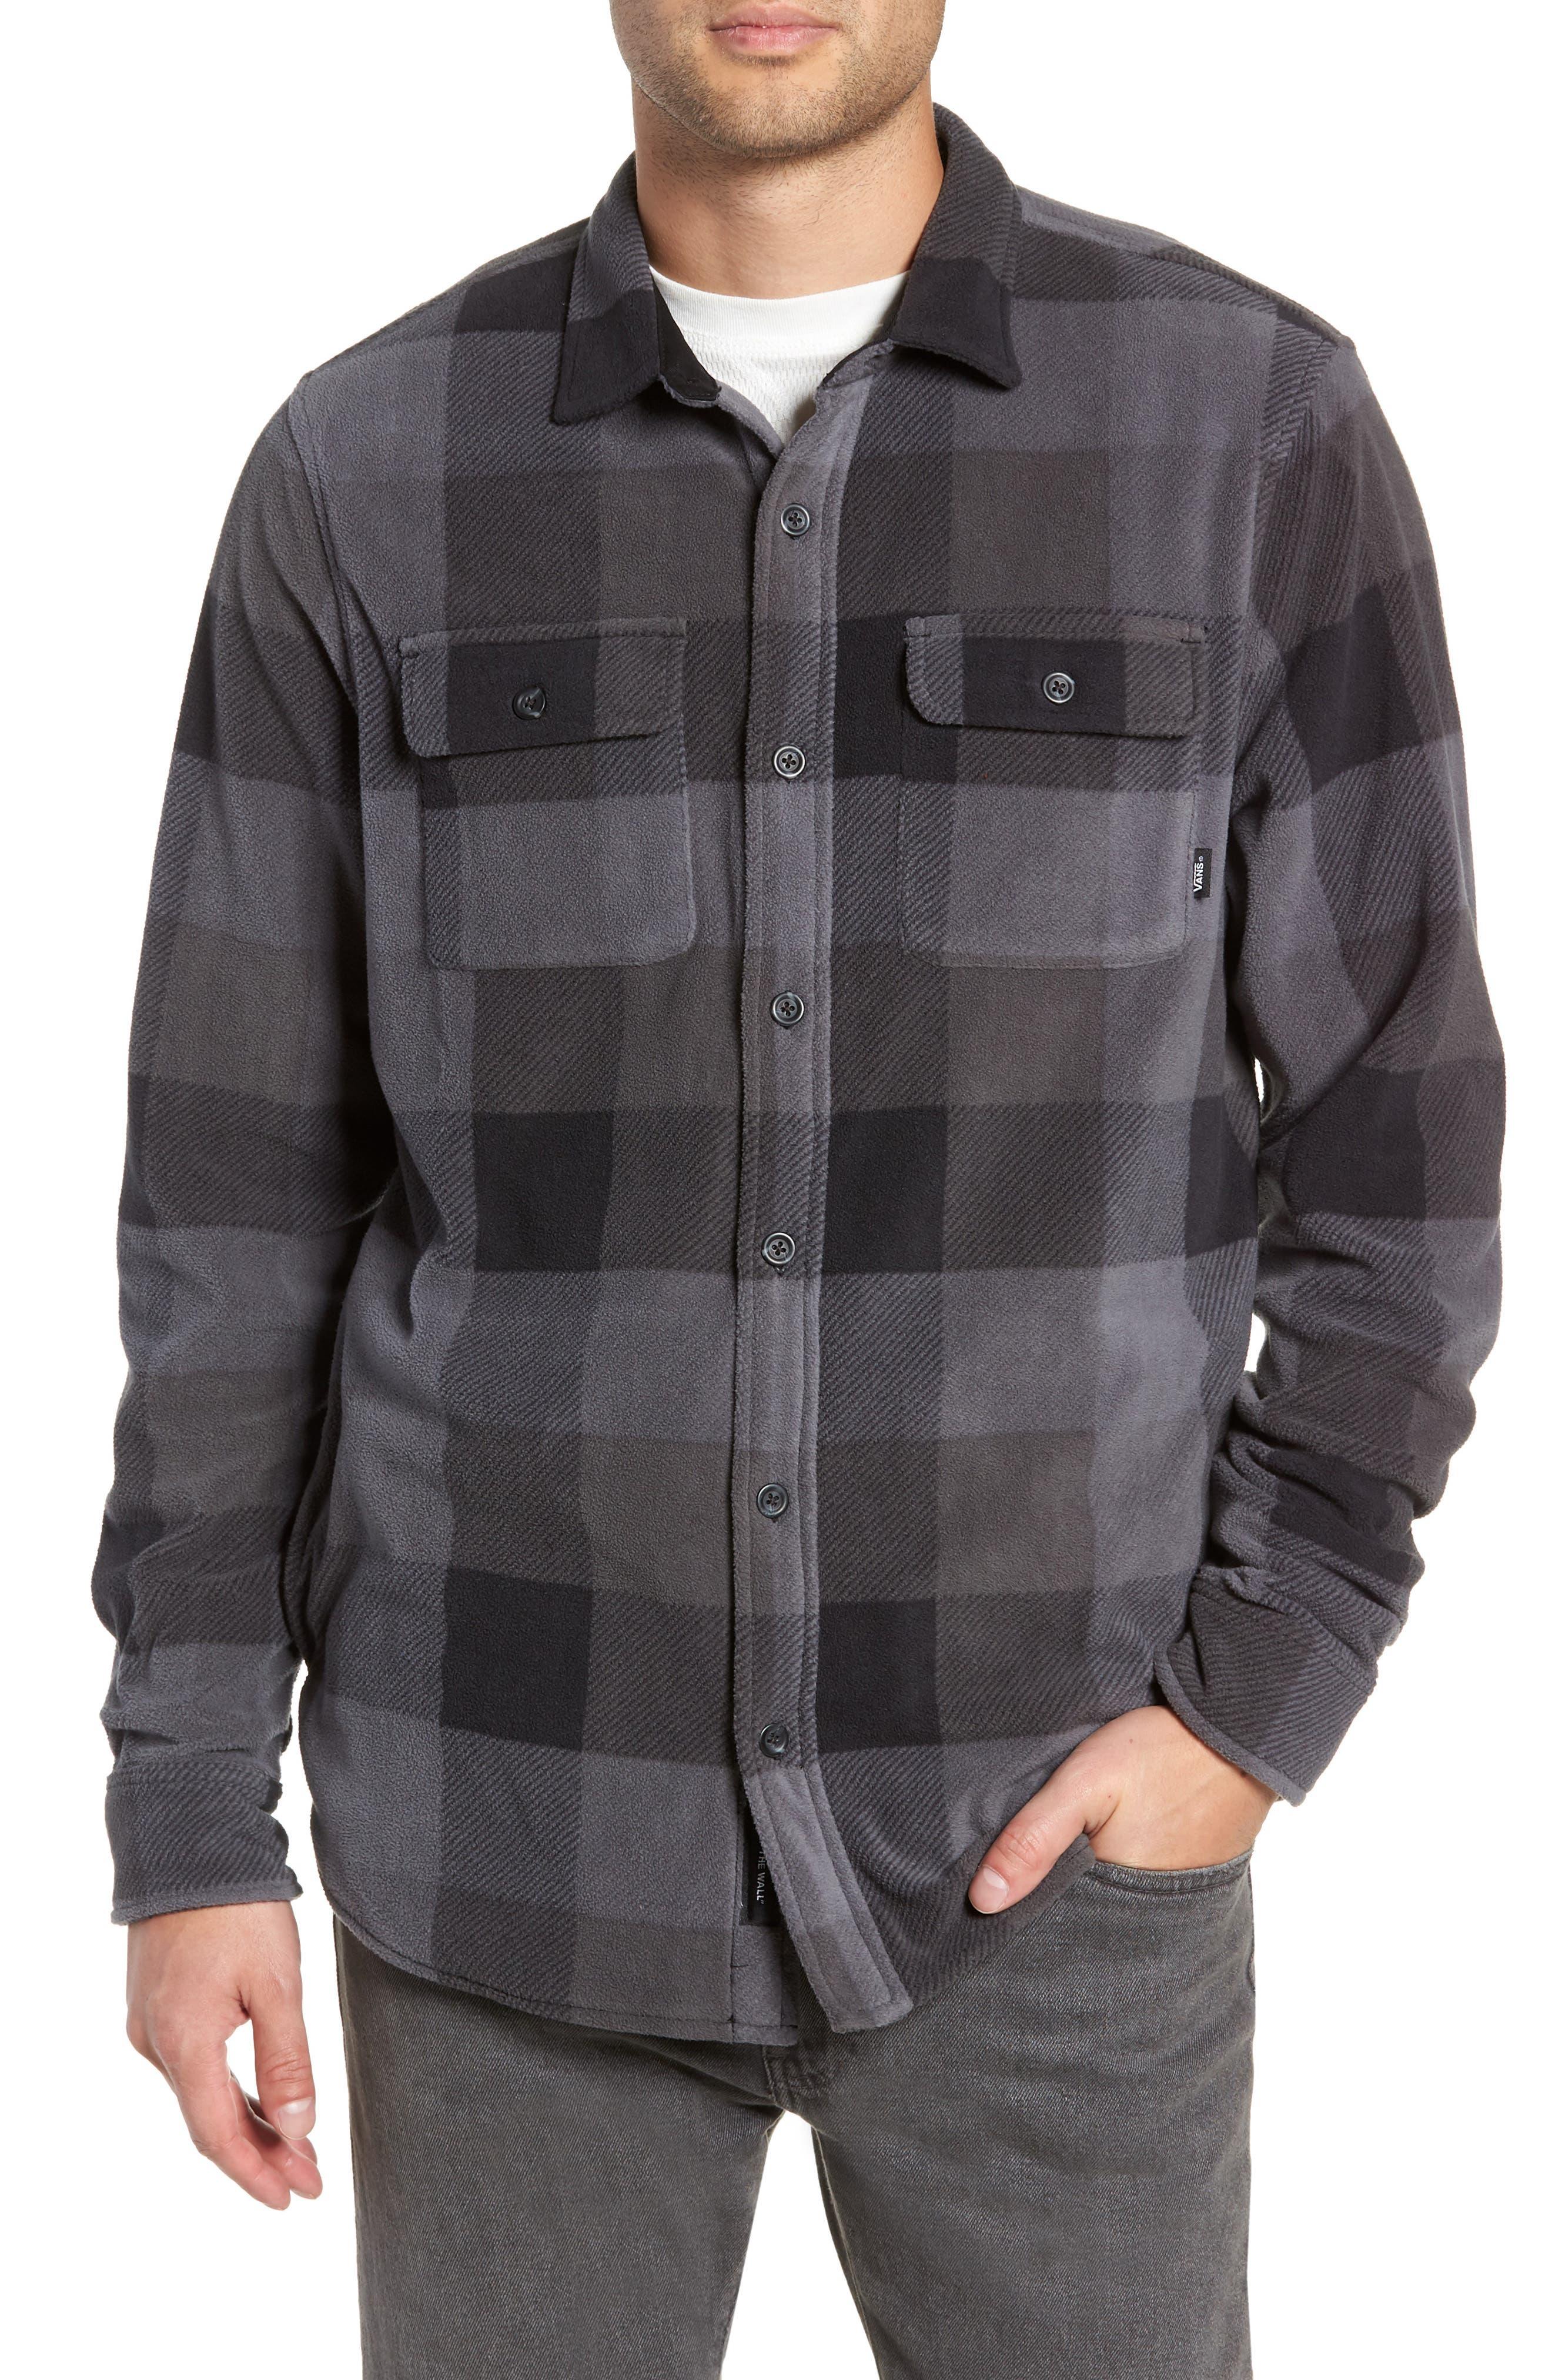 Hillcrest Polar Fleece Shirt Jacket,                             Main thumbnail 1, color,                             BLACK/ CHARCOAL